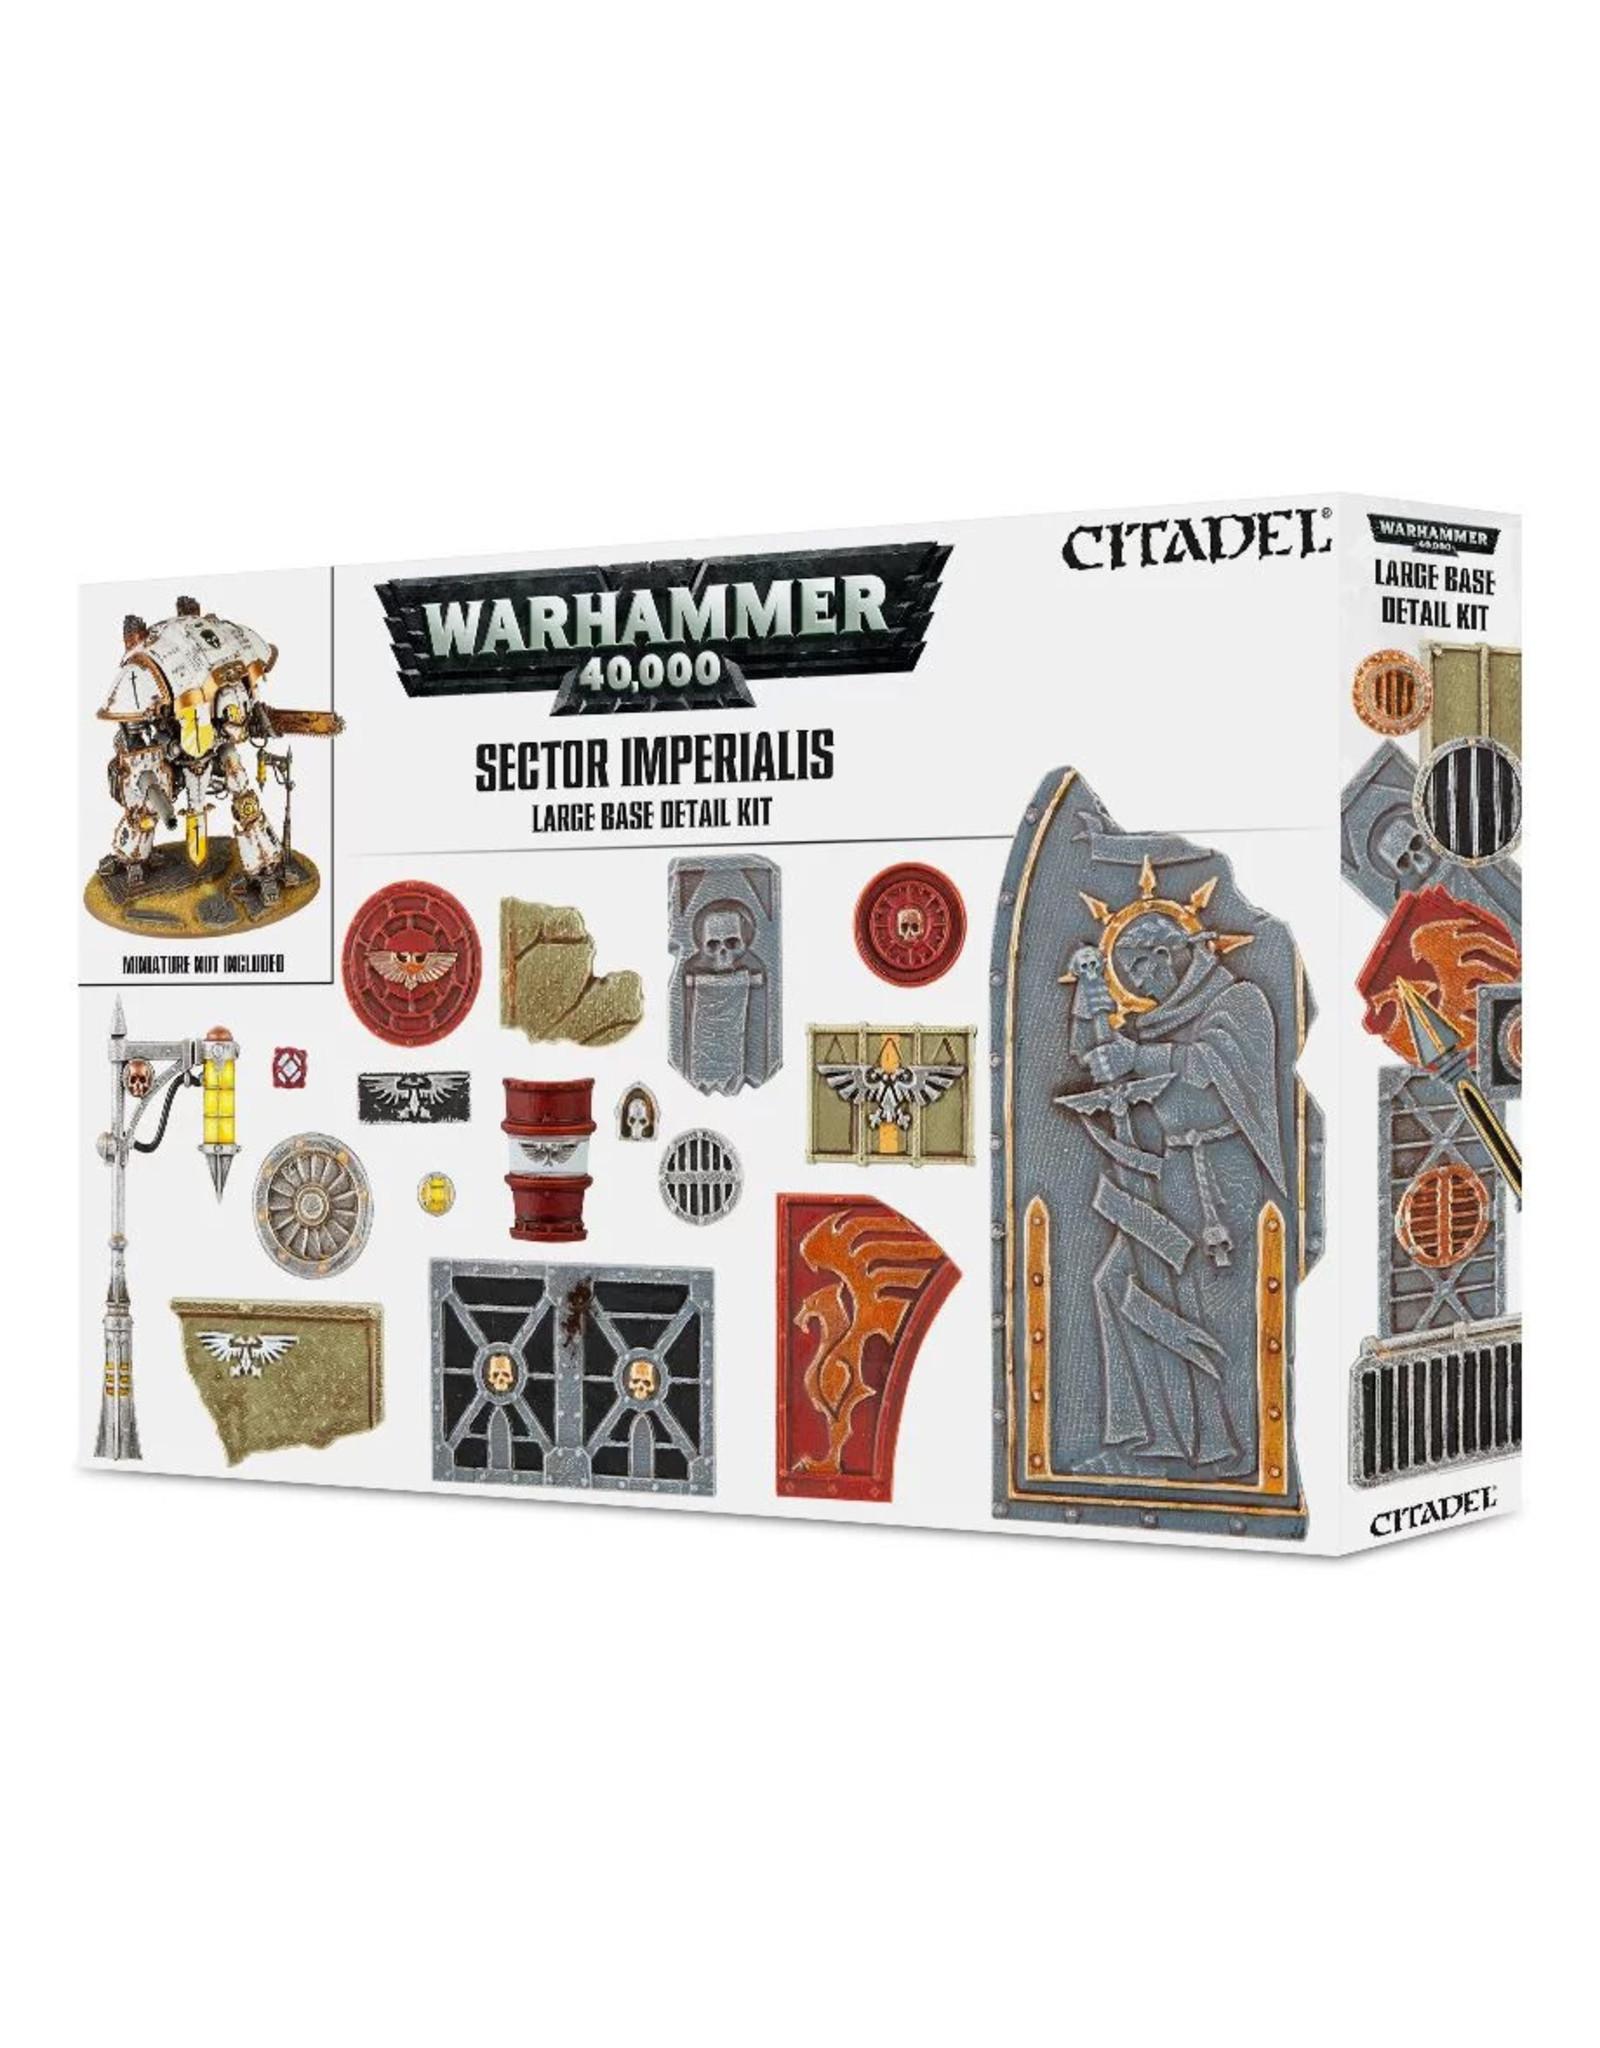 Citadel SECTOR IMPERIALIS: LARGE BASE DETAIL KIT